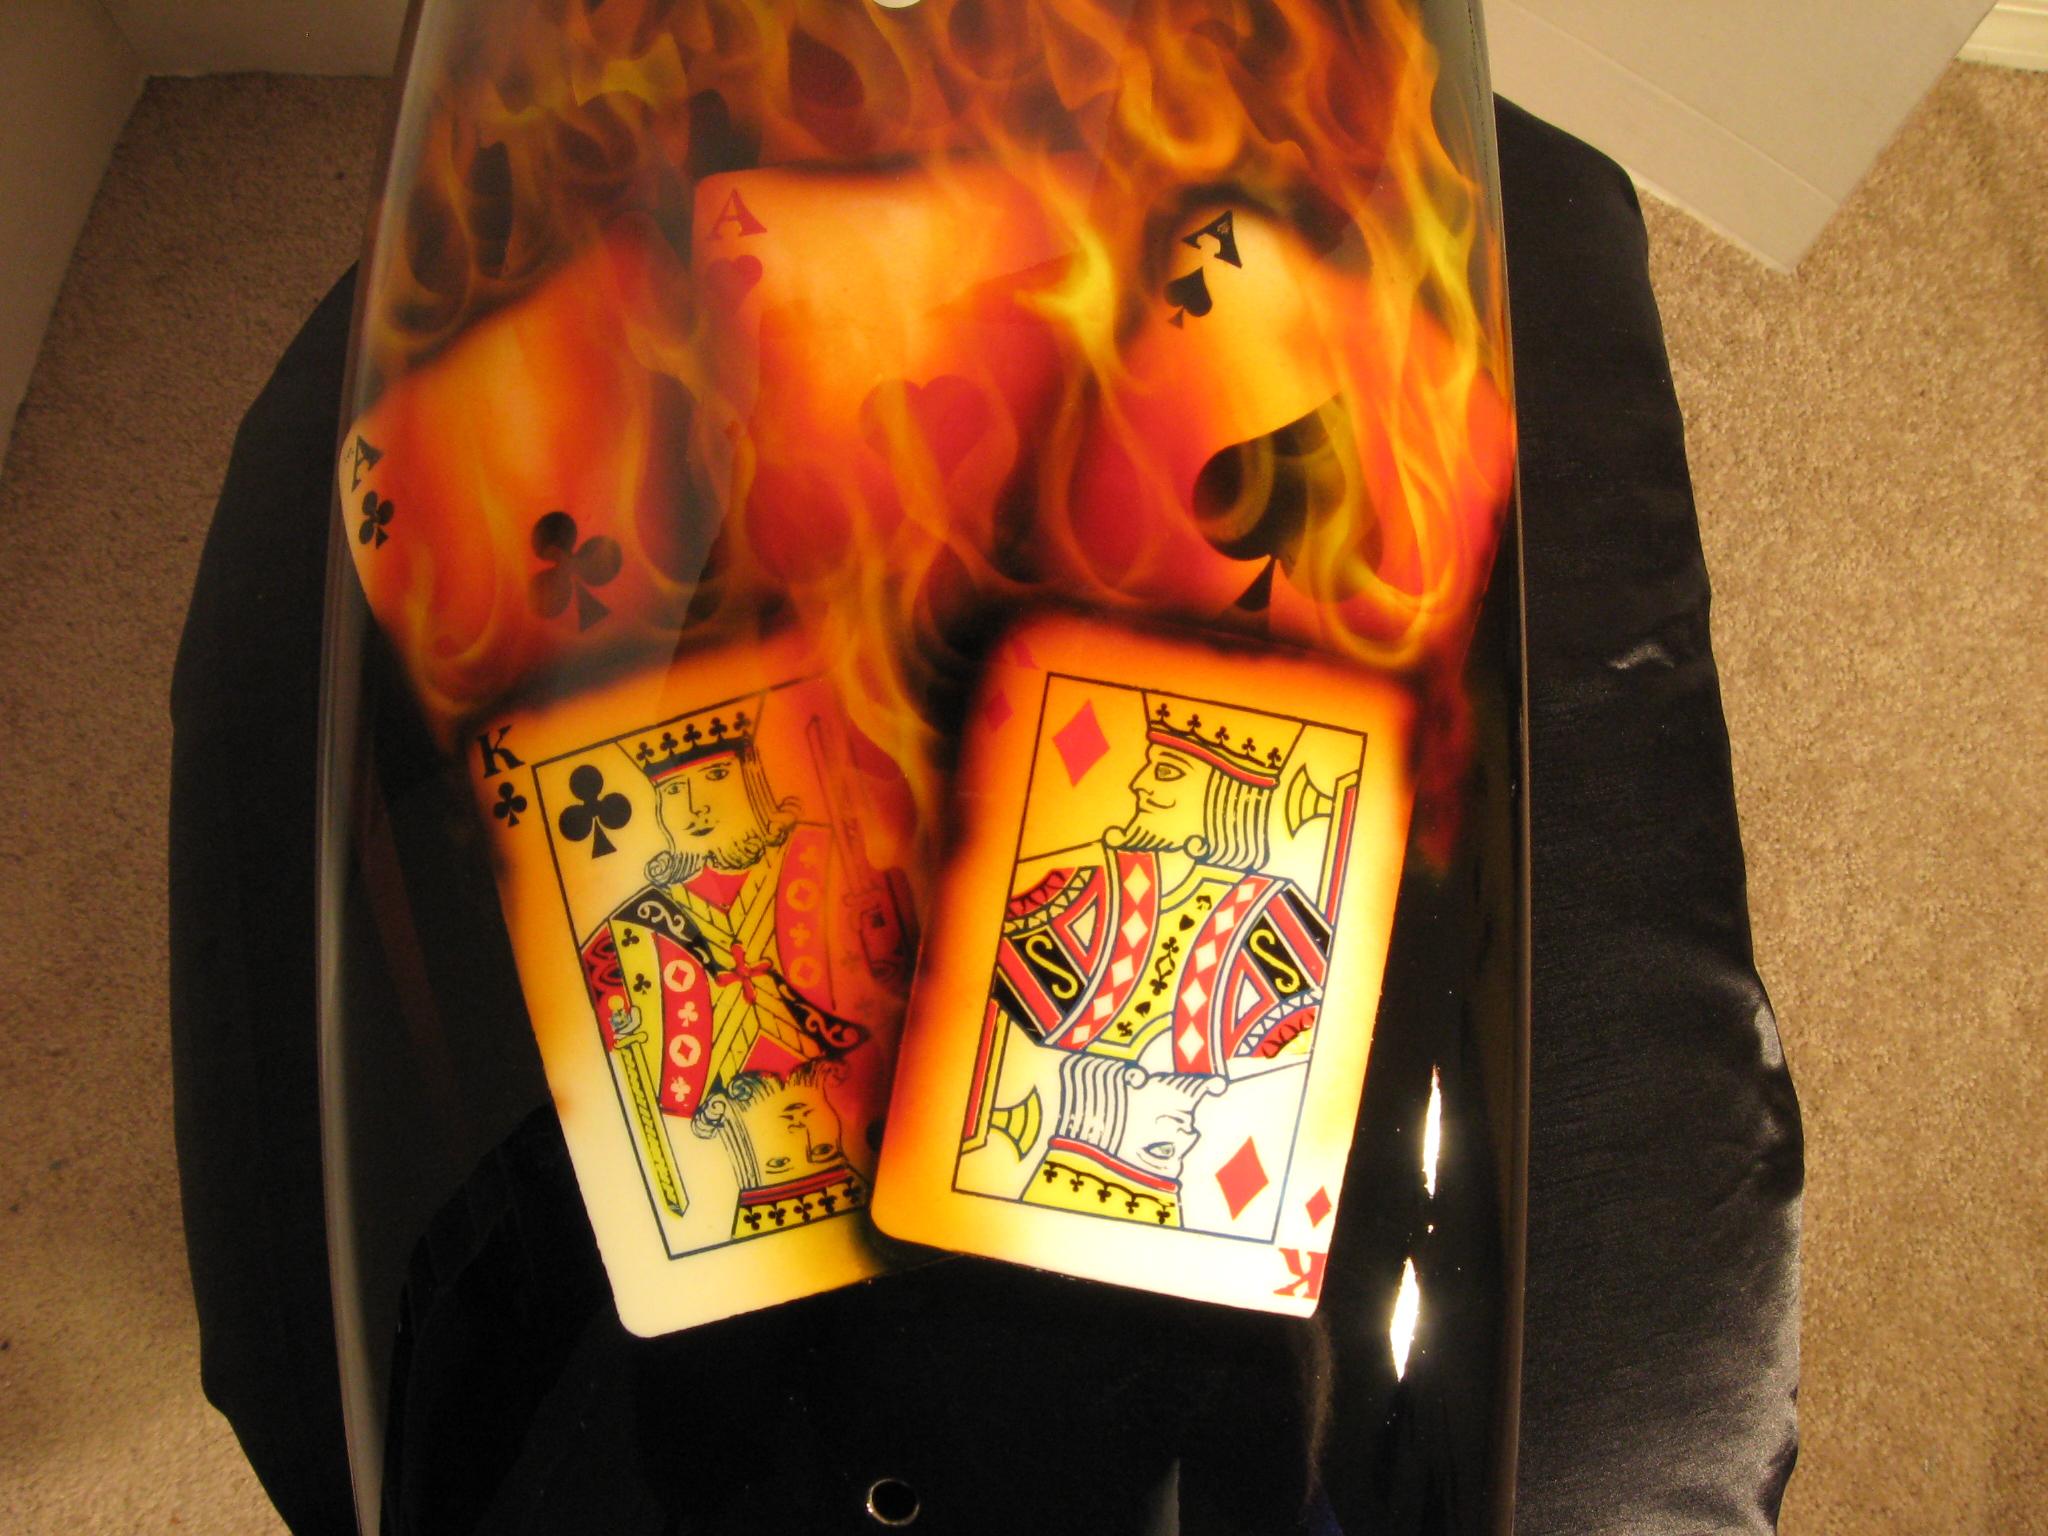 Harley-Davidson-Cards-True-Flames-Full-house-fullhouse-acces-kings-Fender